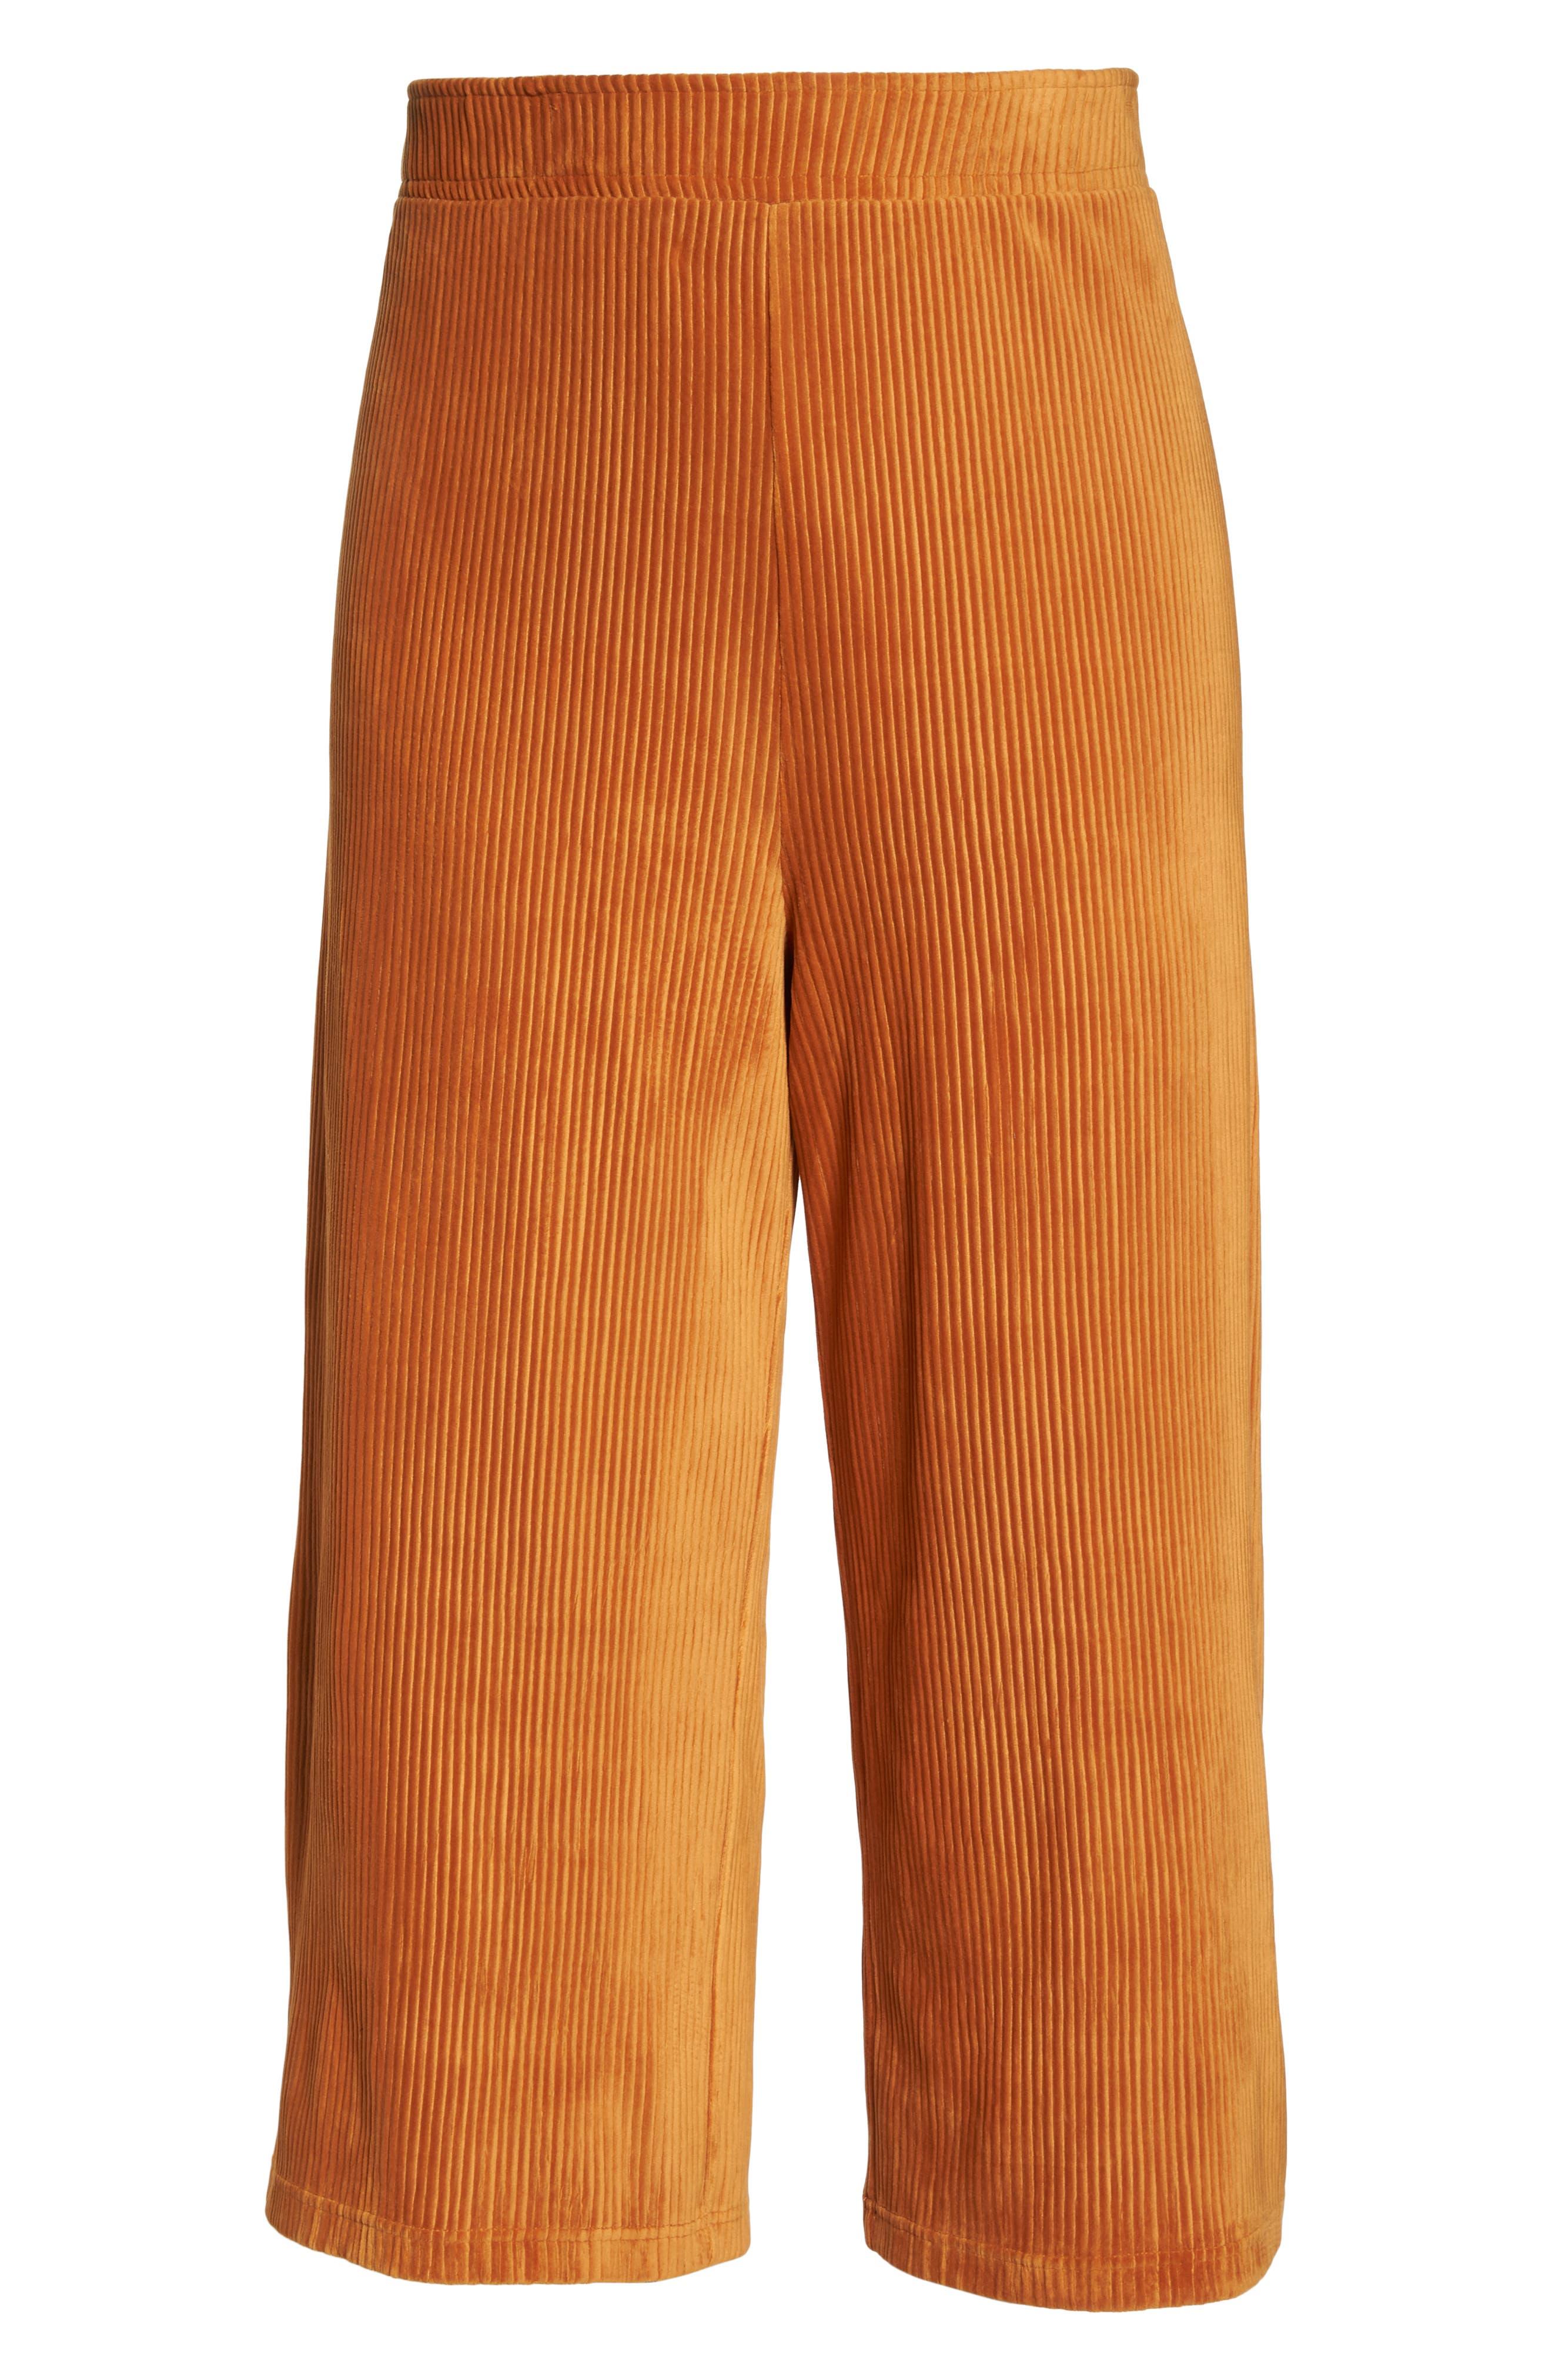 High Rise Knit Corduroy Crop Pants,                             Alternate thumbnail 12, color,                             RUST CIDER